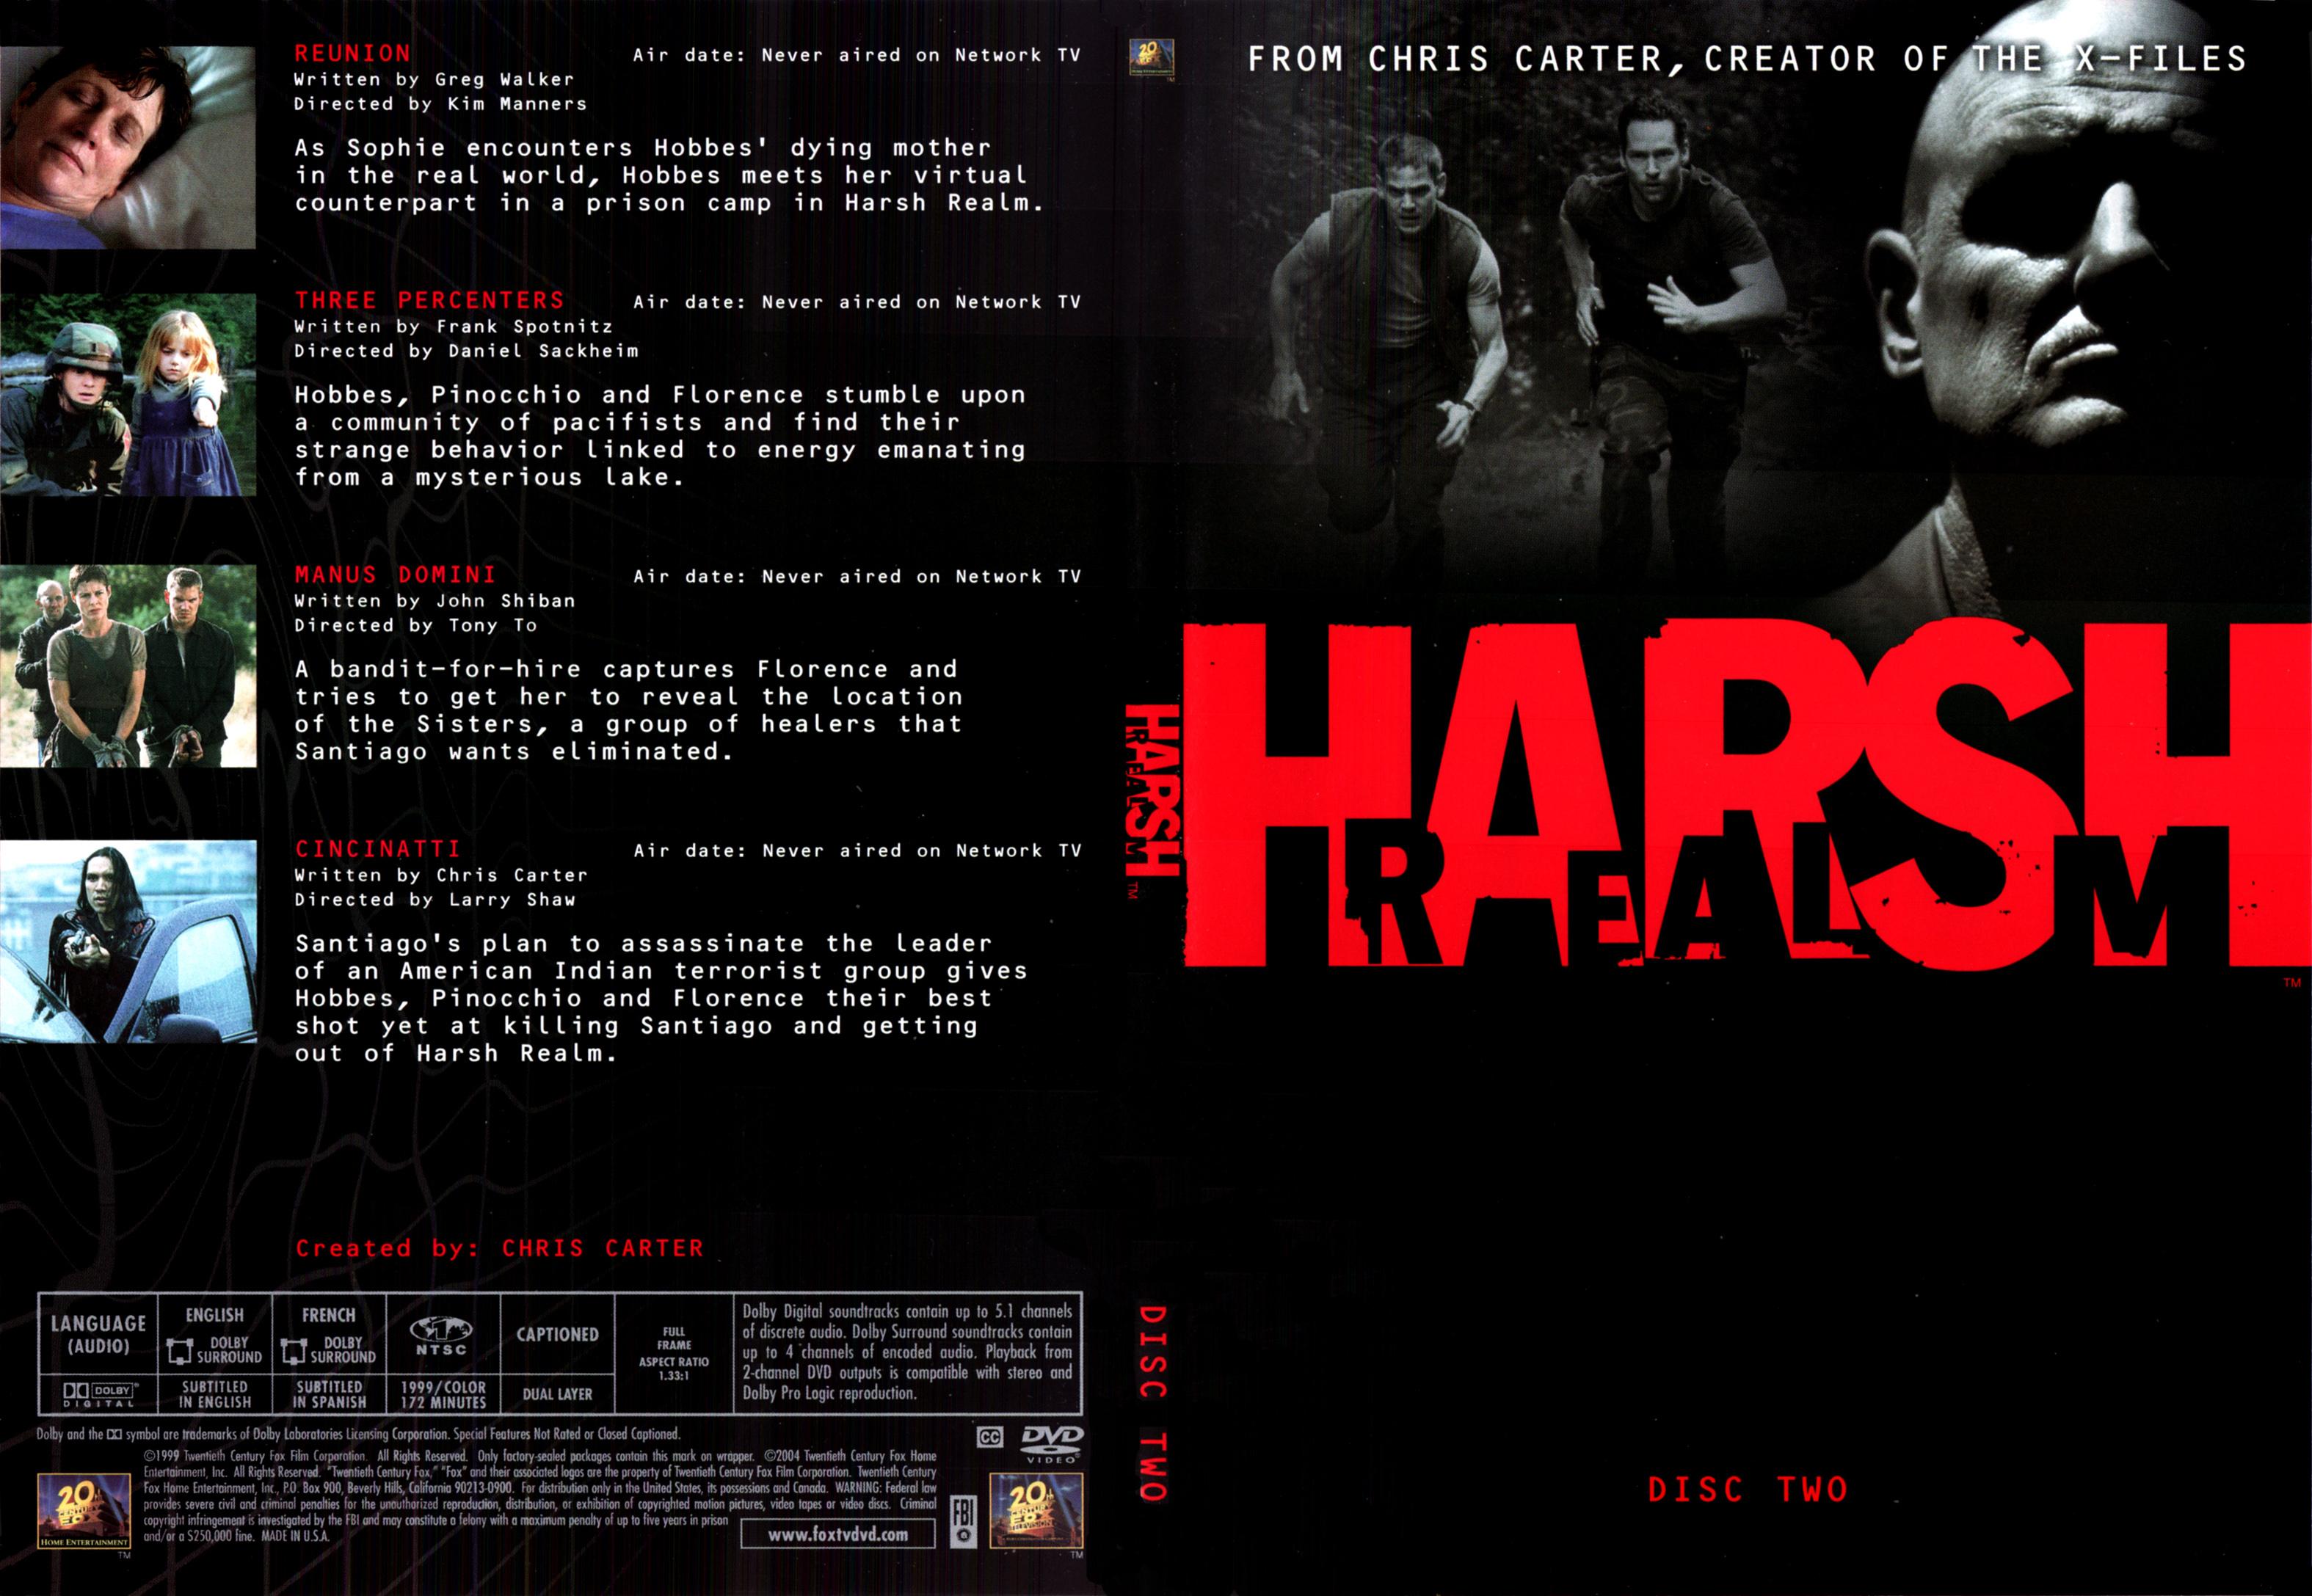 http://covers.box.sk/newsimg/dvdmov/max1182197007-back-cover.jpg